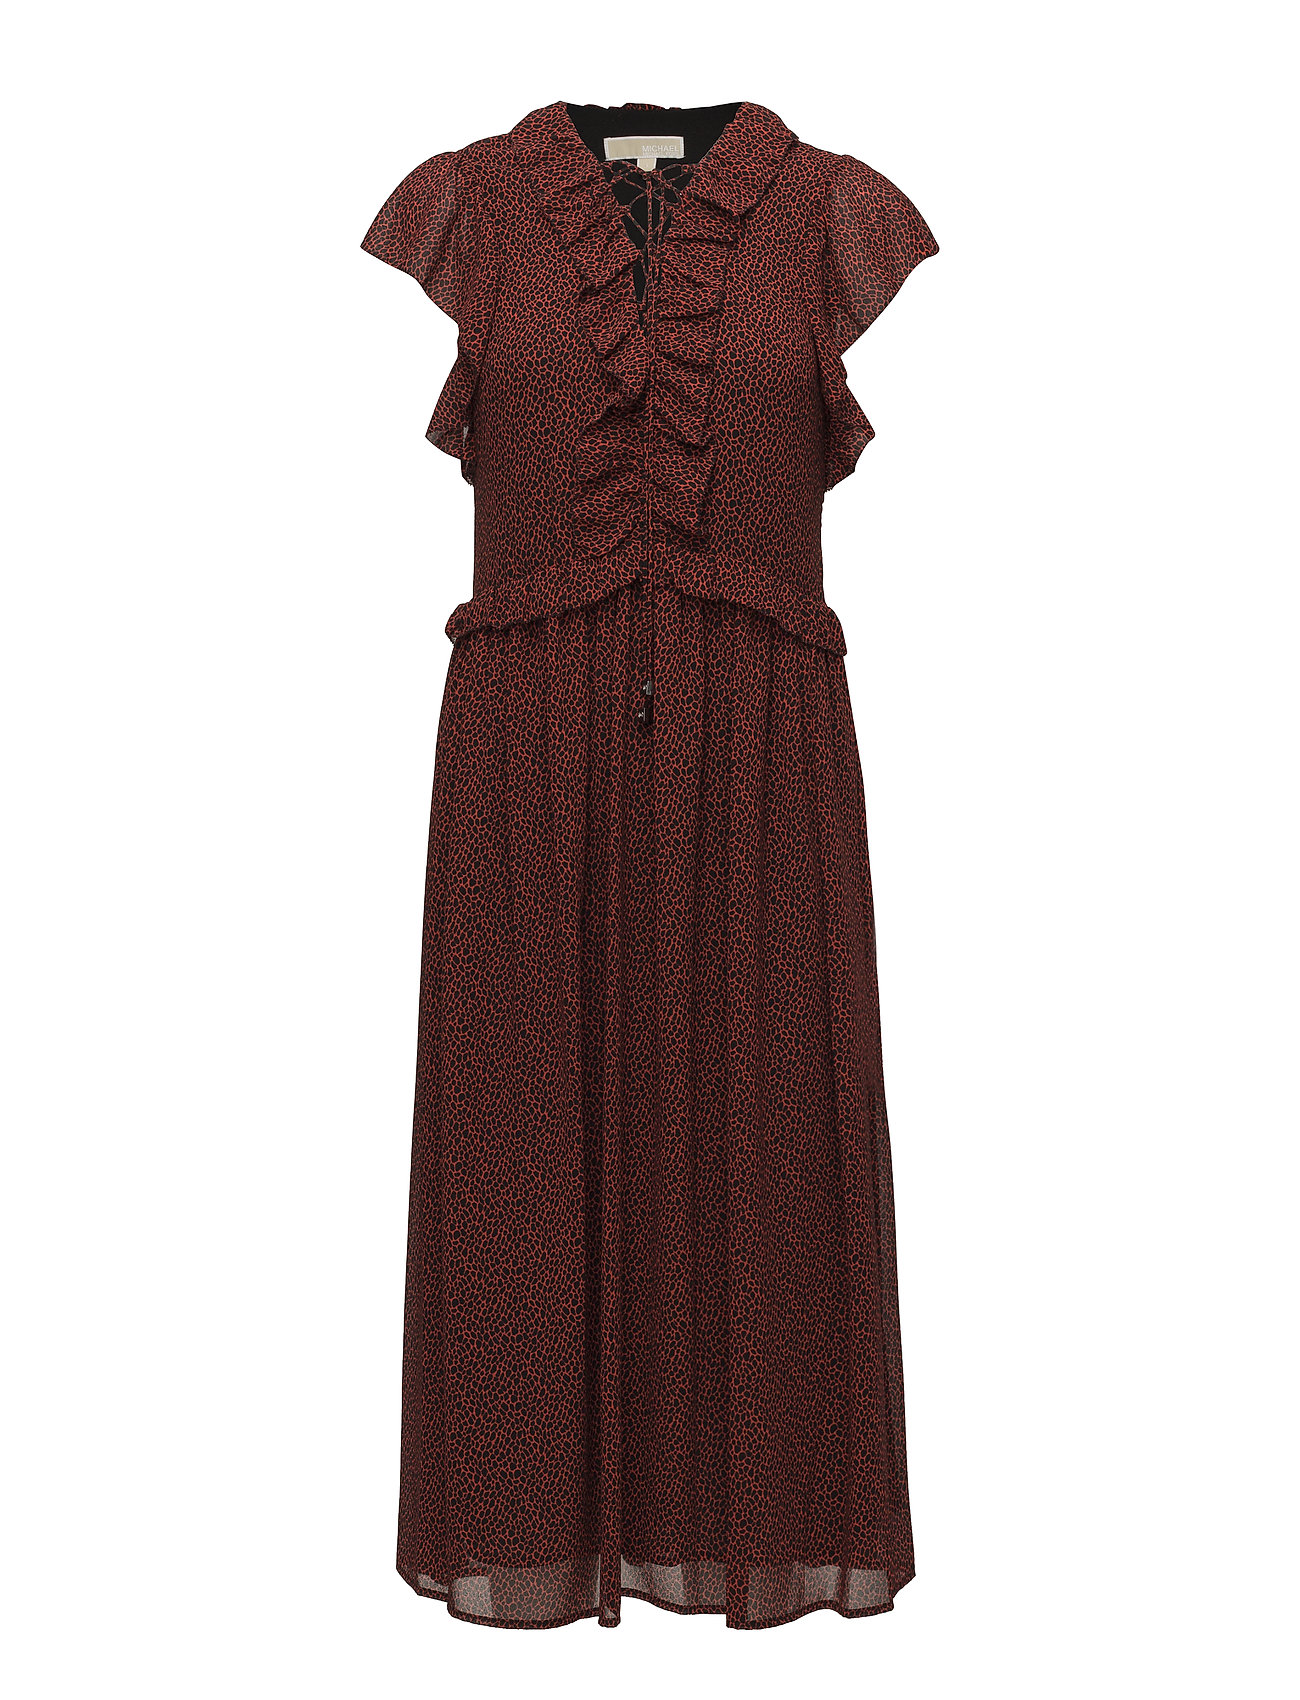 c73d9ef8 Lace Up Maxi Dress (Poppyrd/blck) (£118.25) - Michael Kors - | Boozt.com